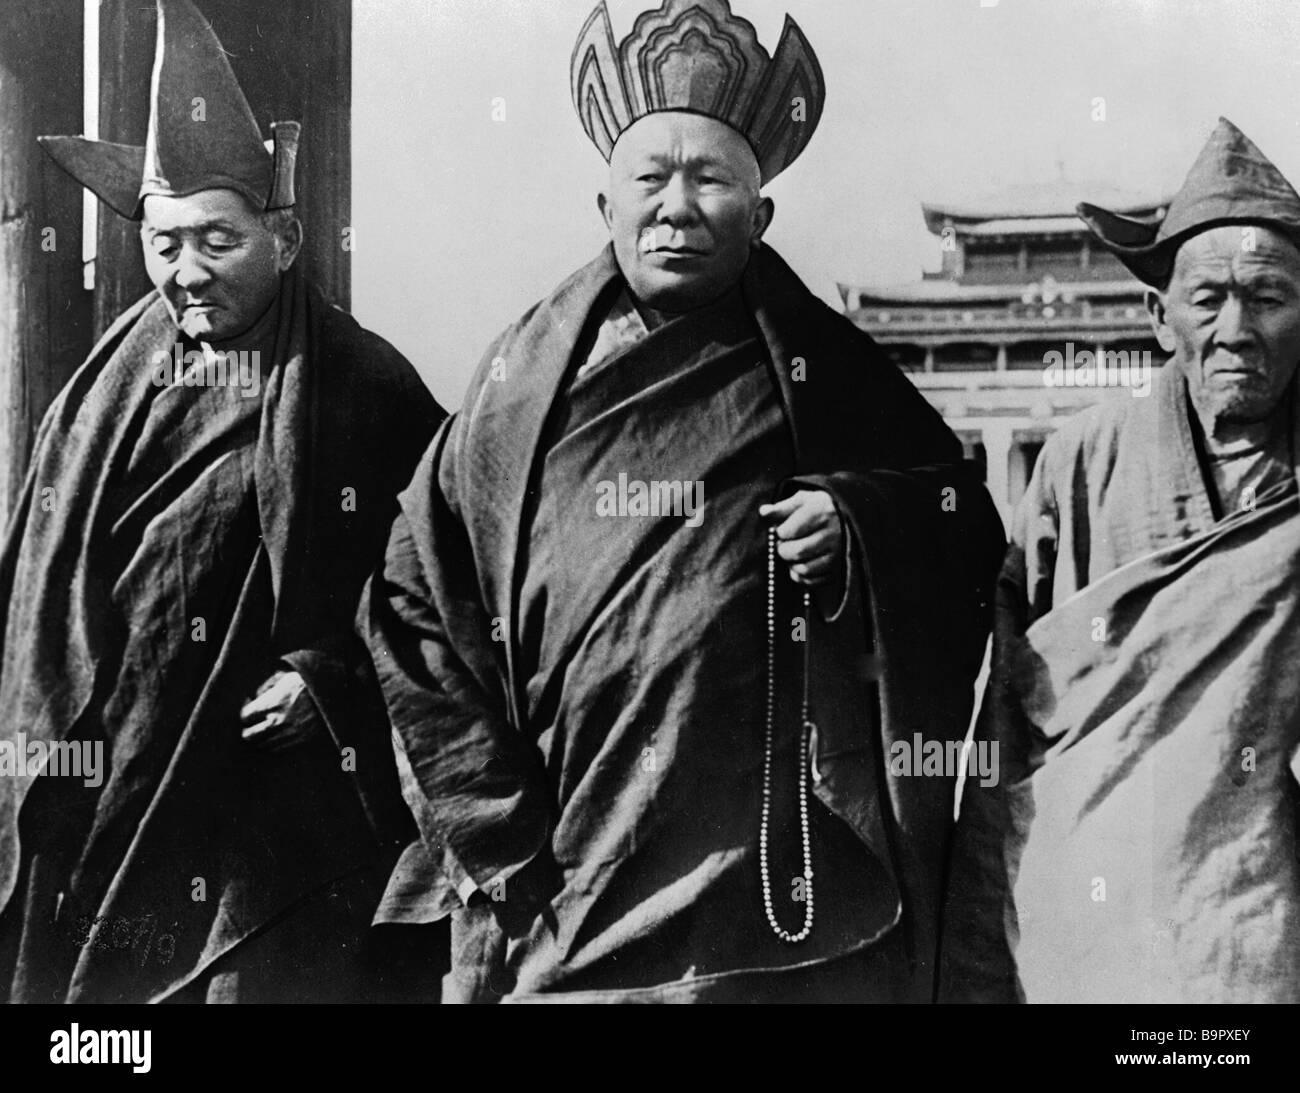 F Ivanov as Lama center in film The Descendant of Ghenghiz Khan by Vsevolod Pudovkin - Stock Image